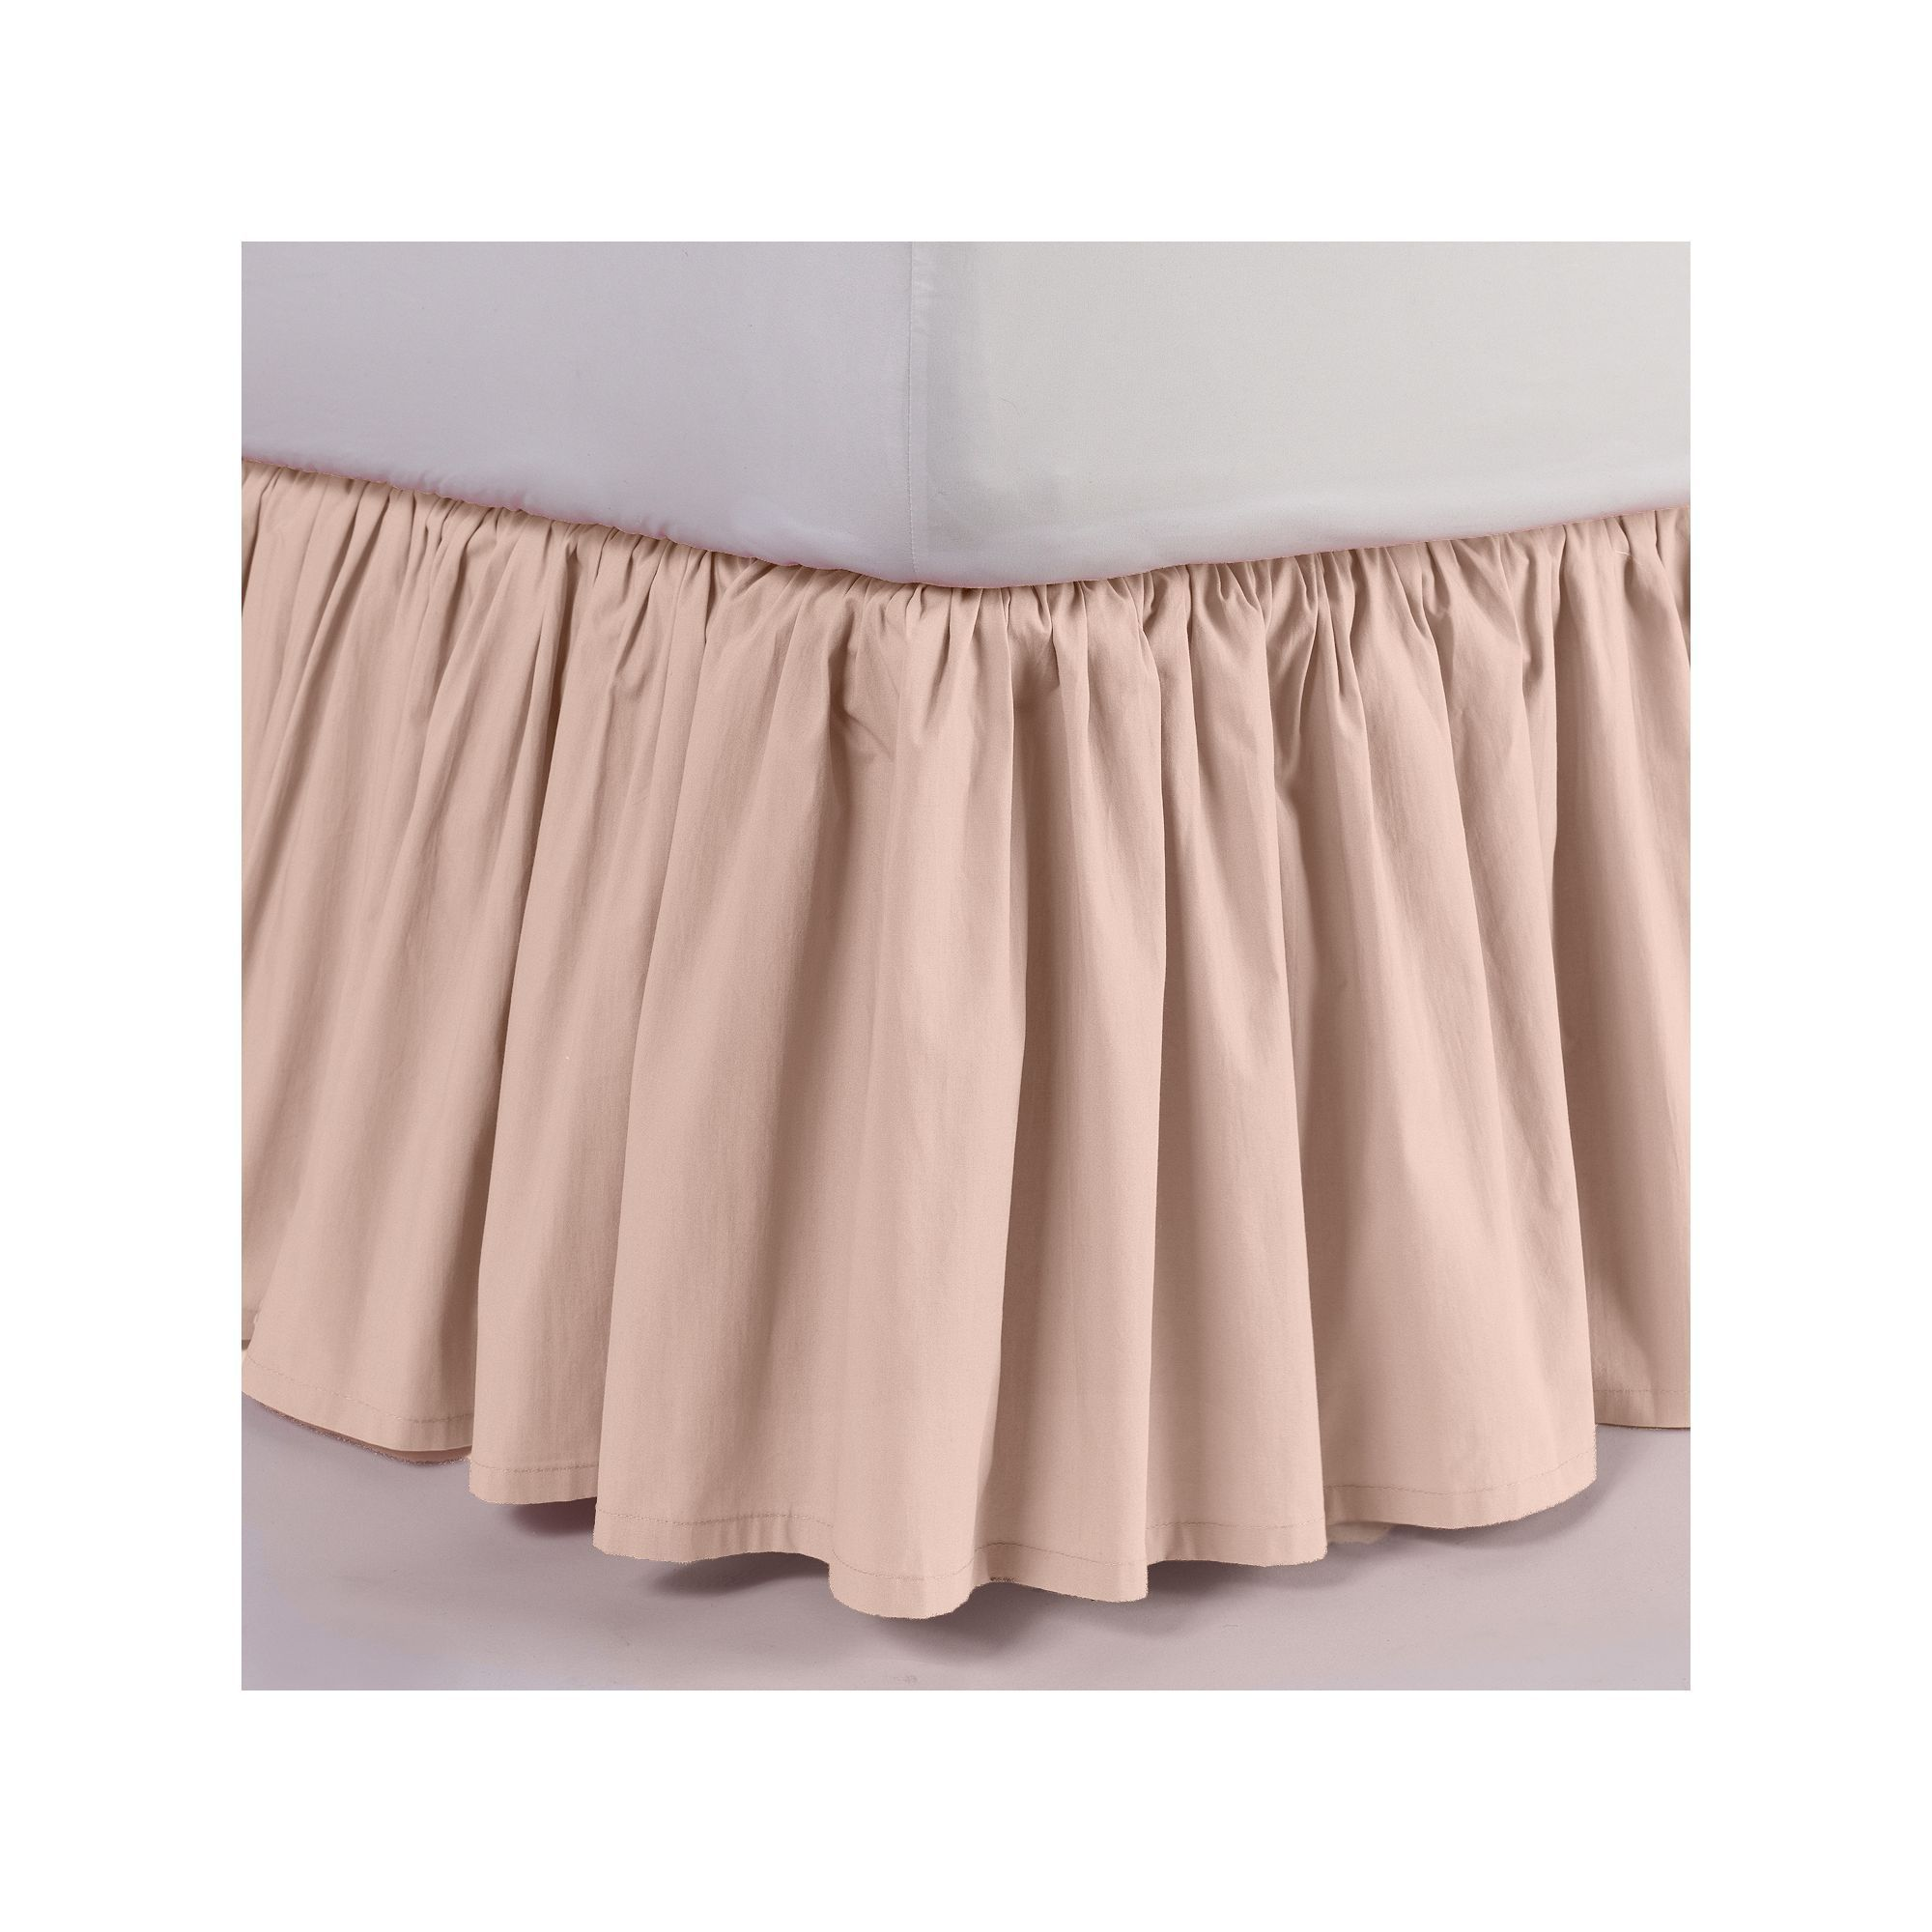 lauren conrad ruffle bed skirt ruffle bed skirts ruffle bedding